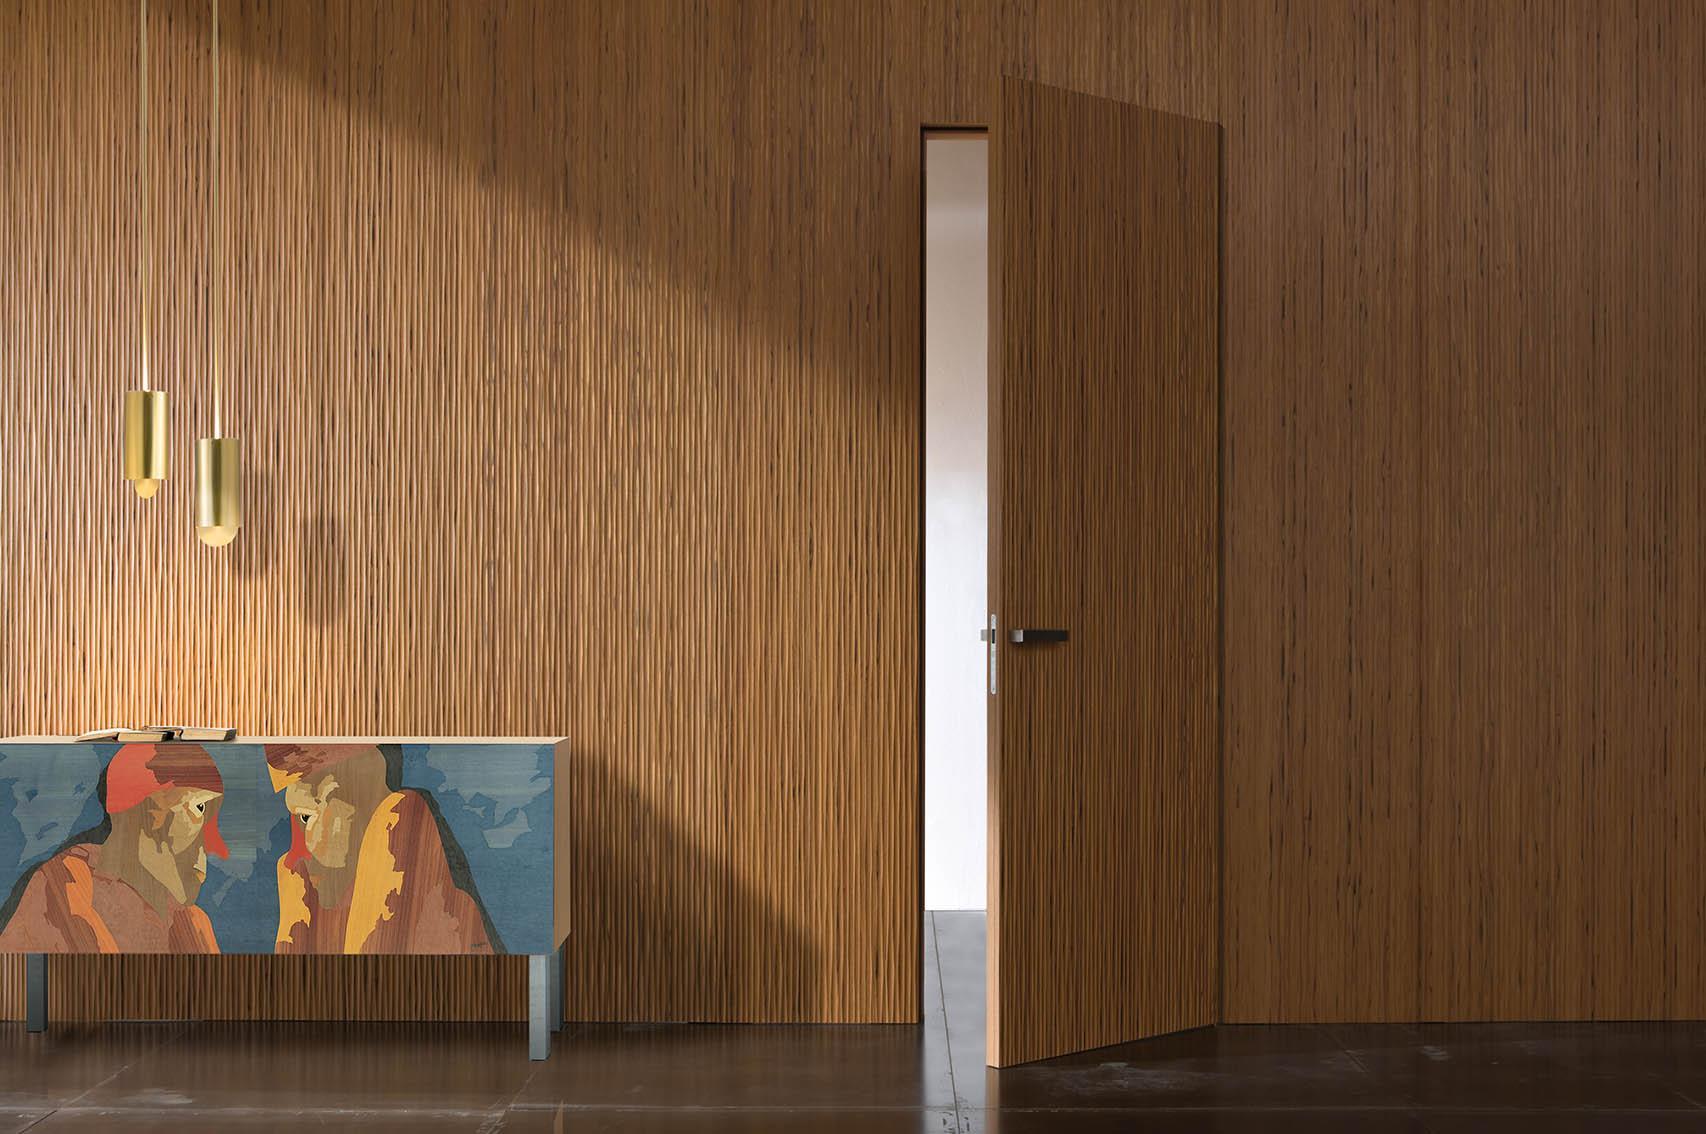 Laurameroni luxury modern integrated hinged doors for a bespoke artisanal interior design and decor